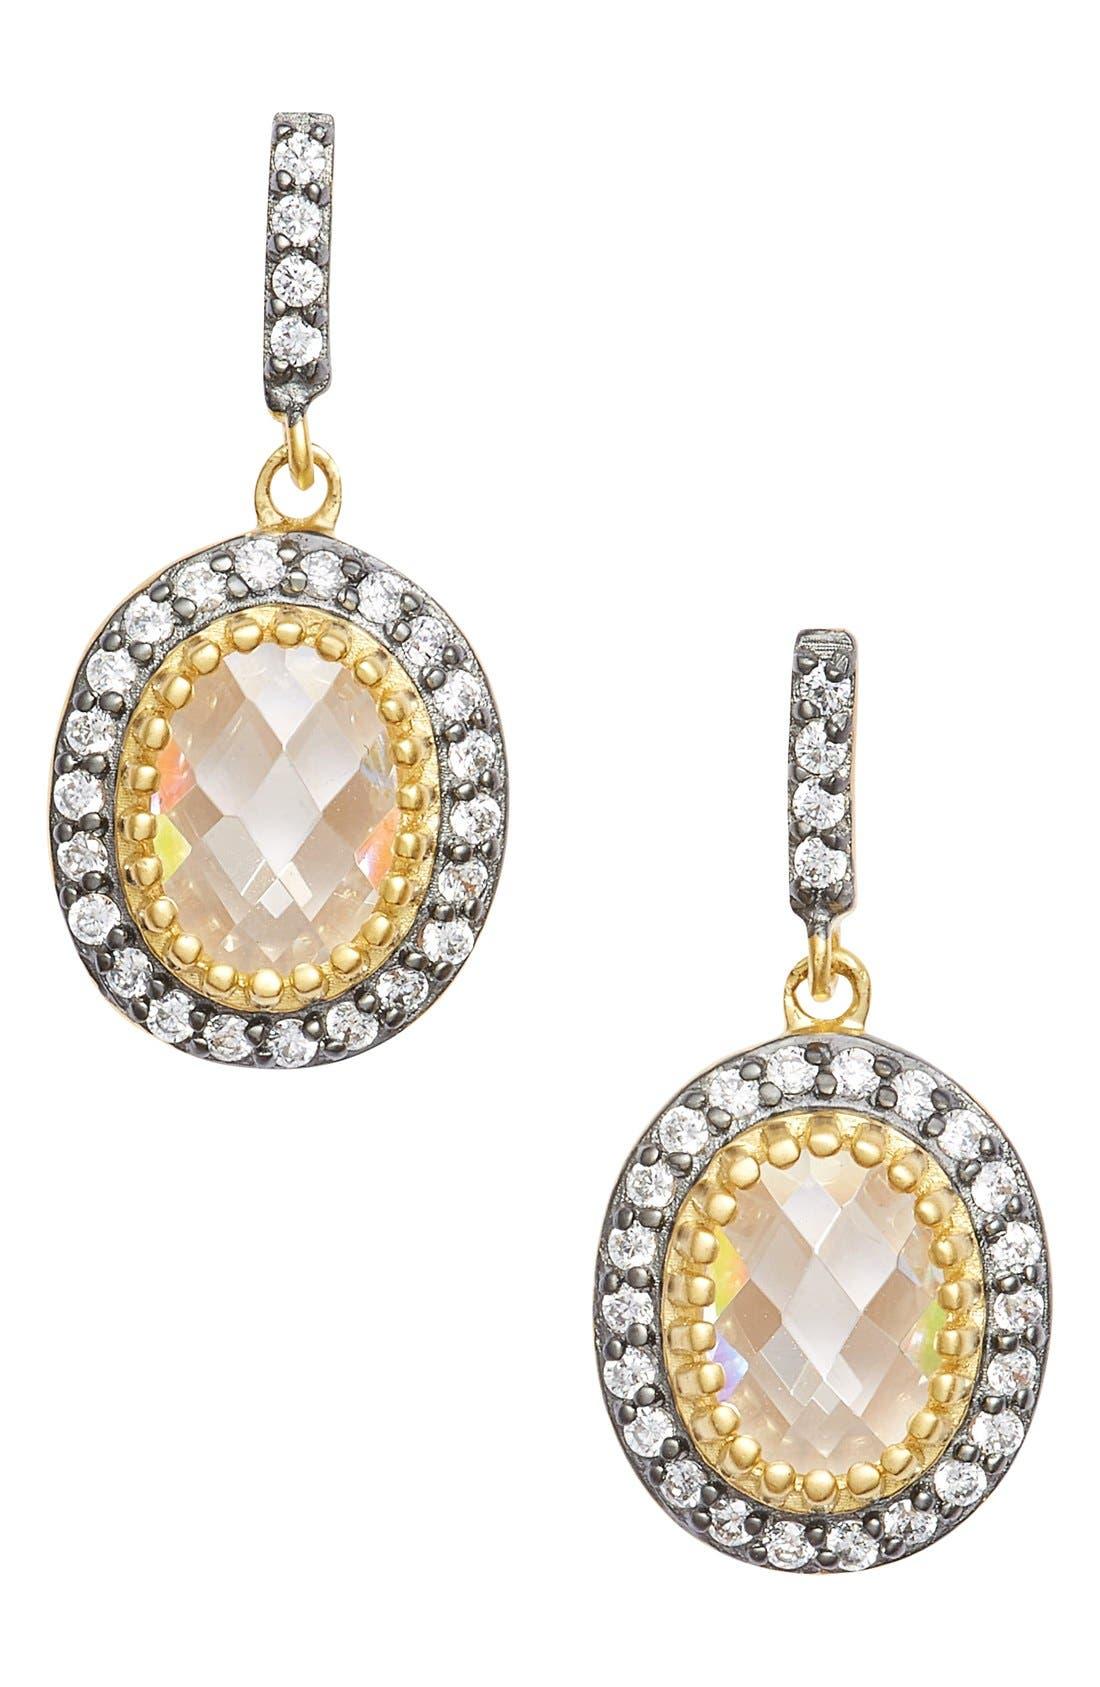 Main Image - FREIDA ROTHMAN Opera Drop Earrings